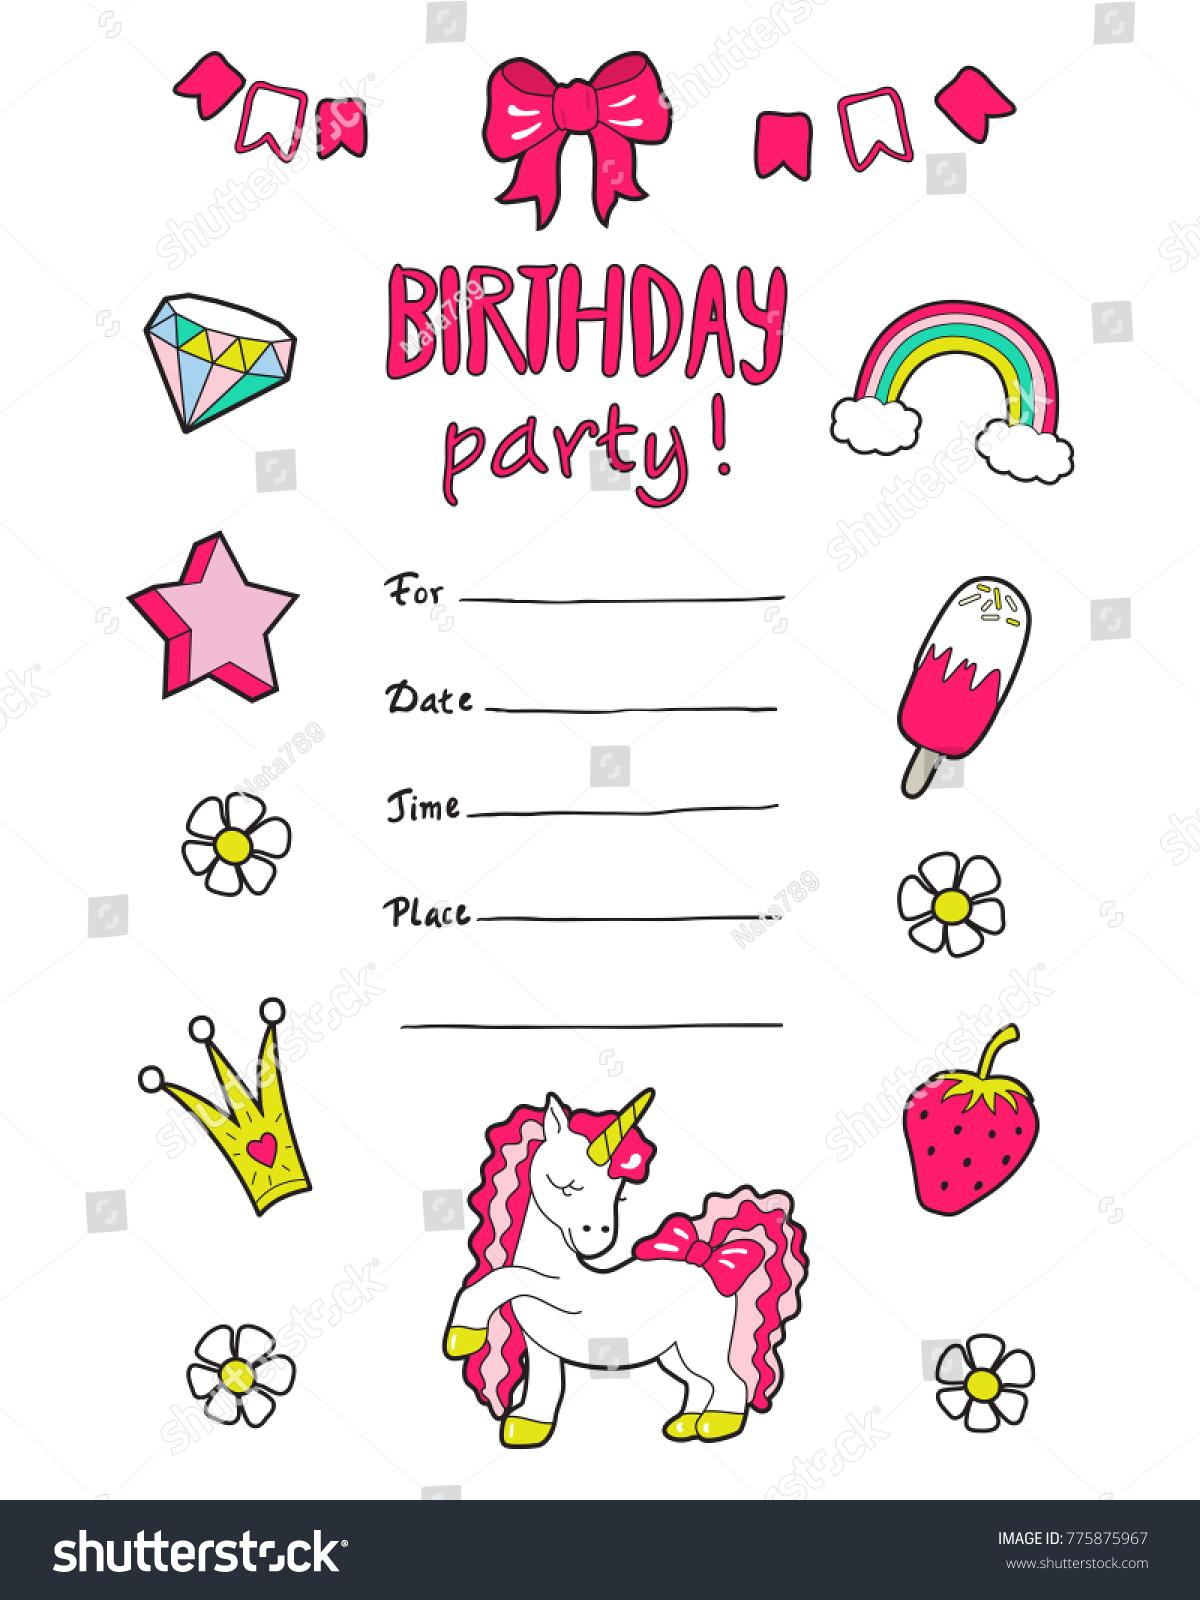 Girls party invitation cute stickers vector stock vector 775875967 girls party invitation with cute stickers vector monicamarmolfo Choice Image